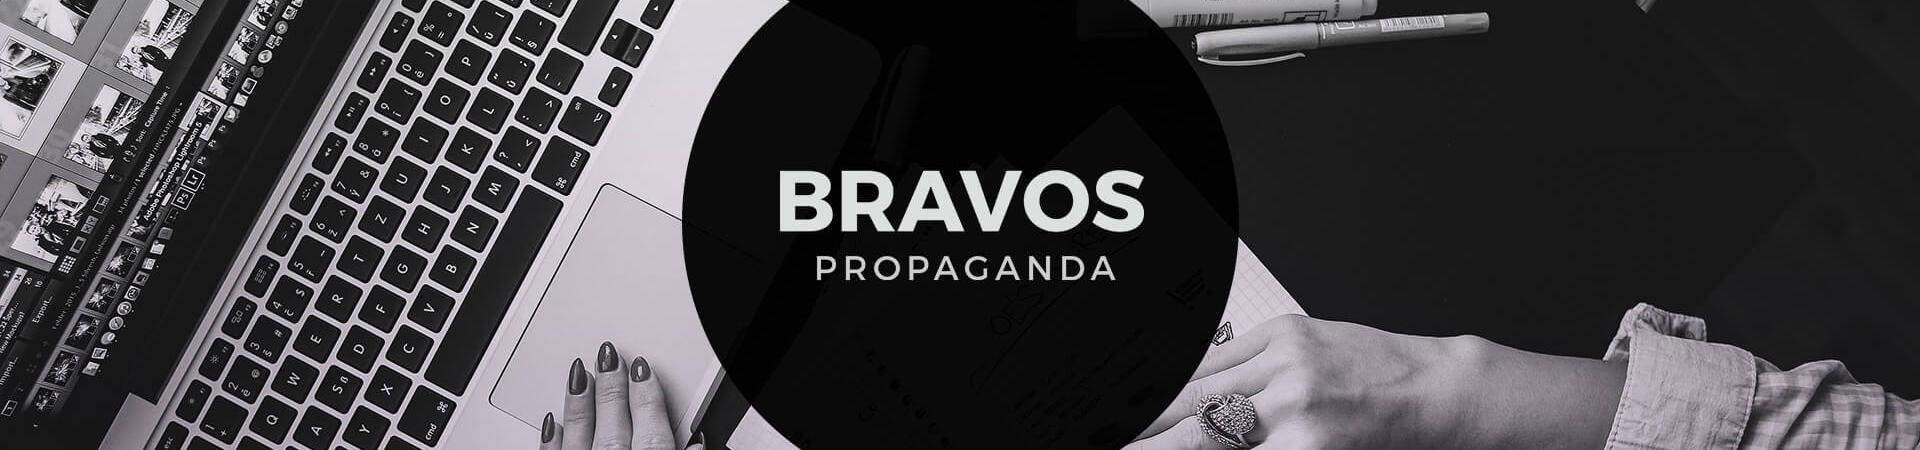 Bravos Propaganda